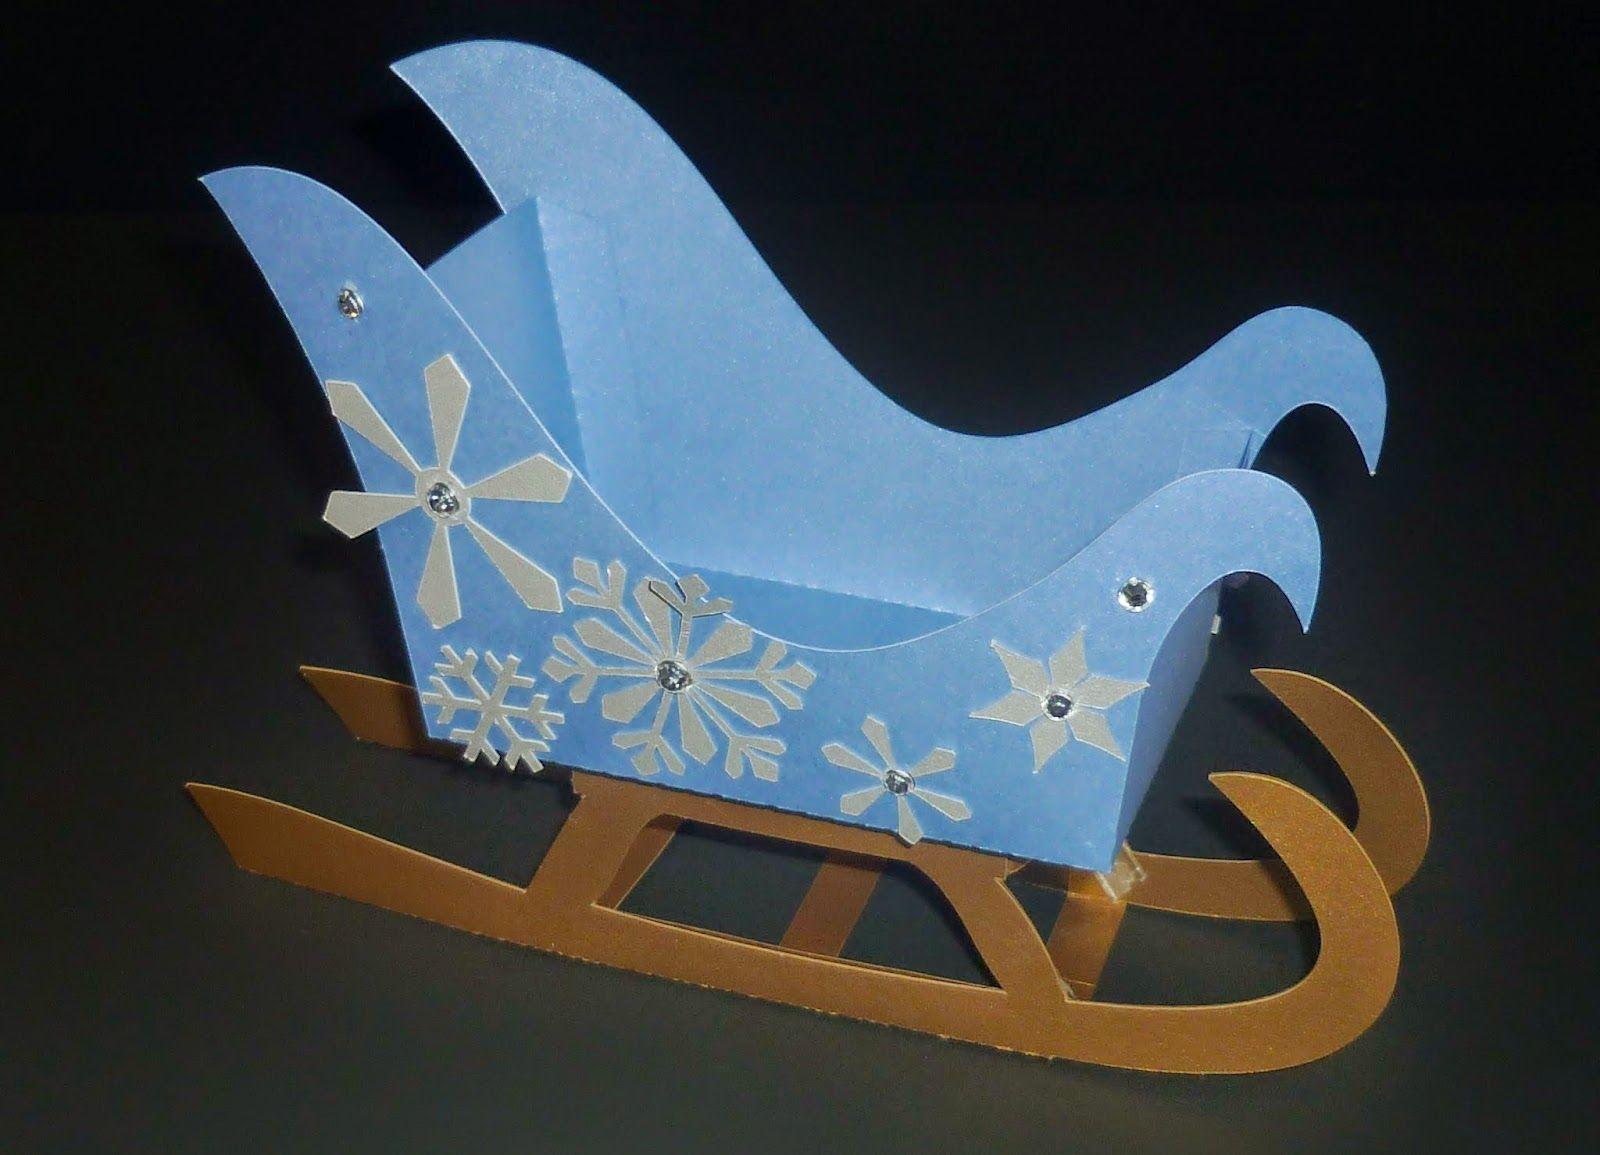 Minimandy trineo papel frozen elsa candy bar navidad for Trineo madera decoracion